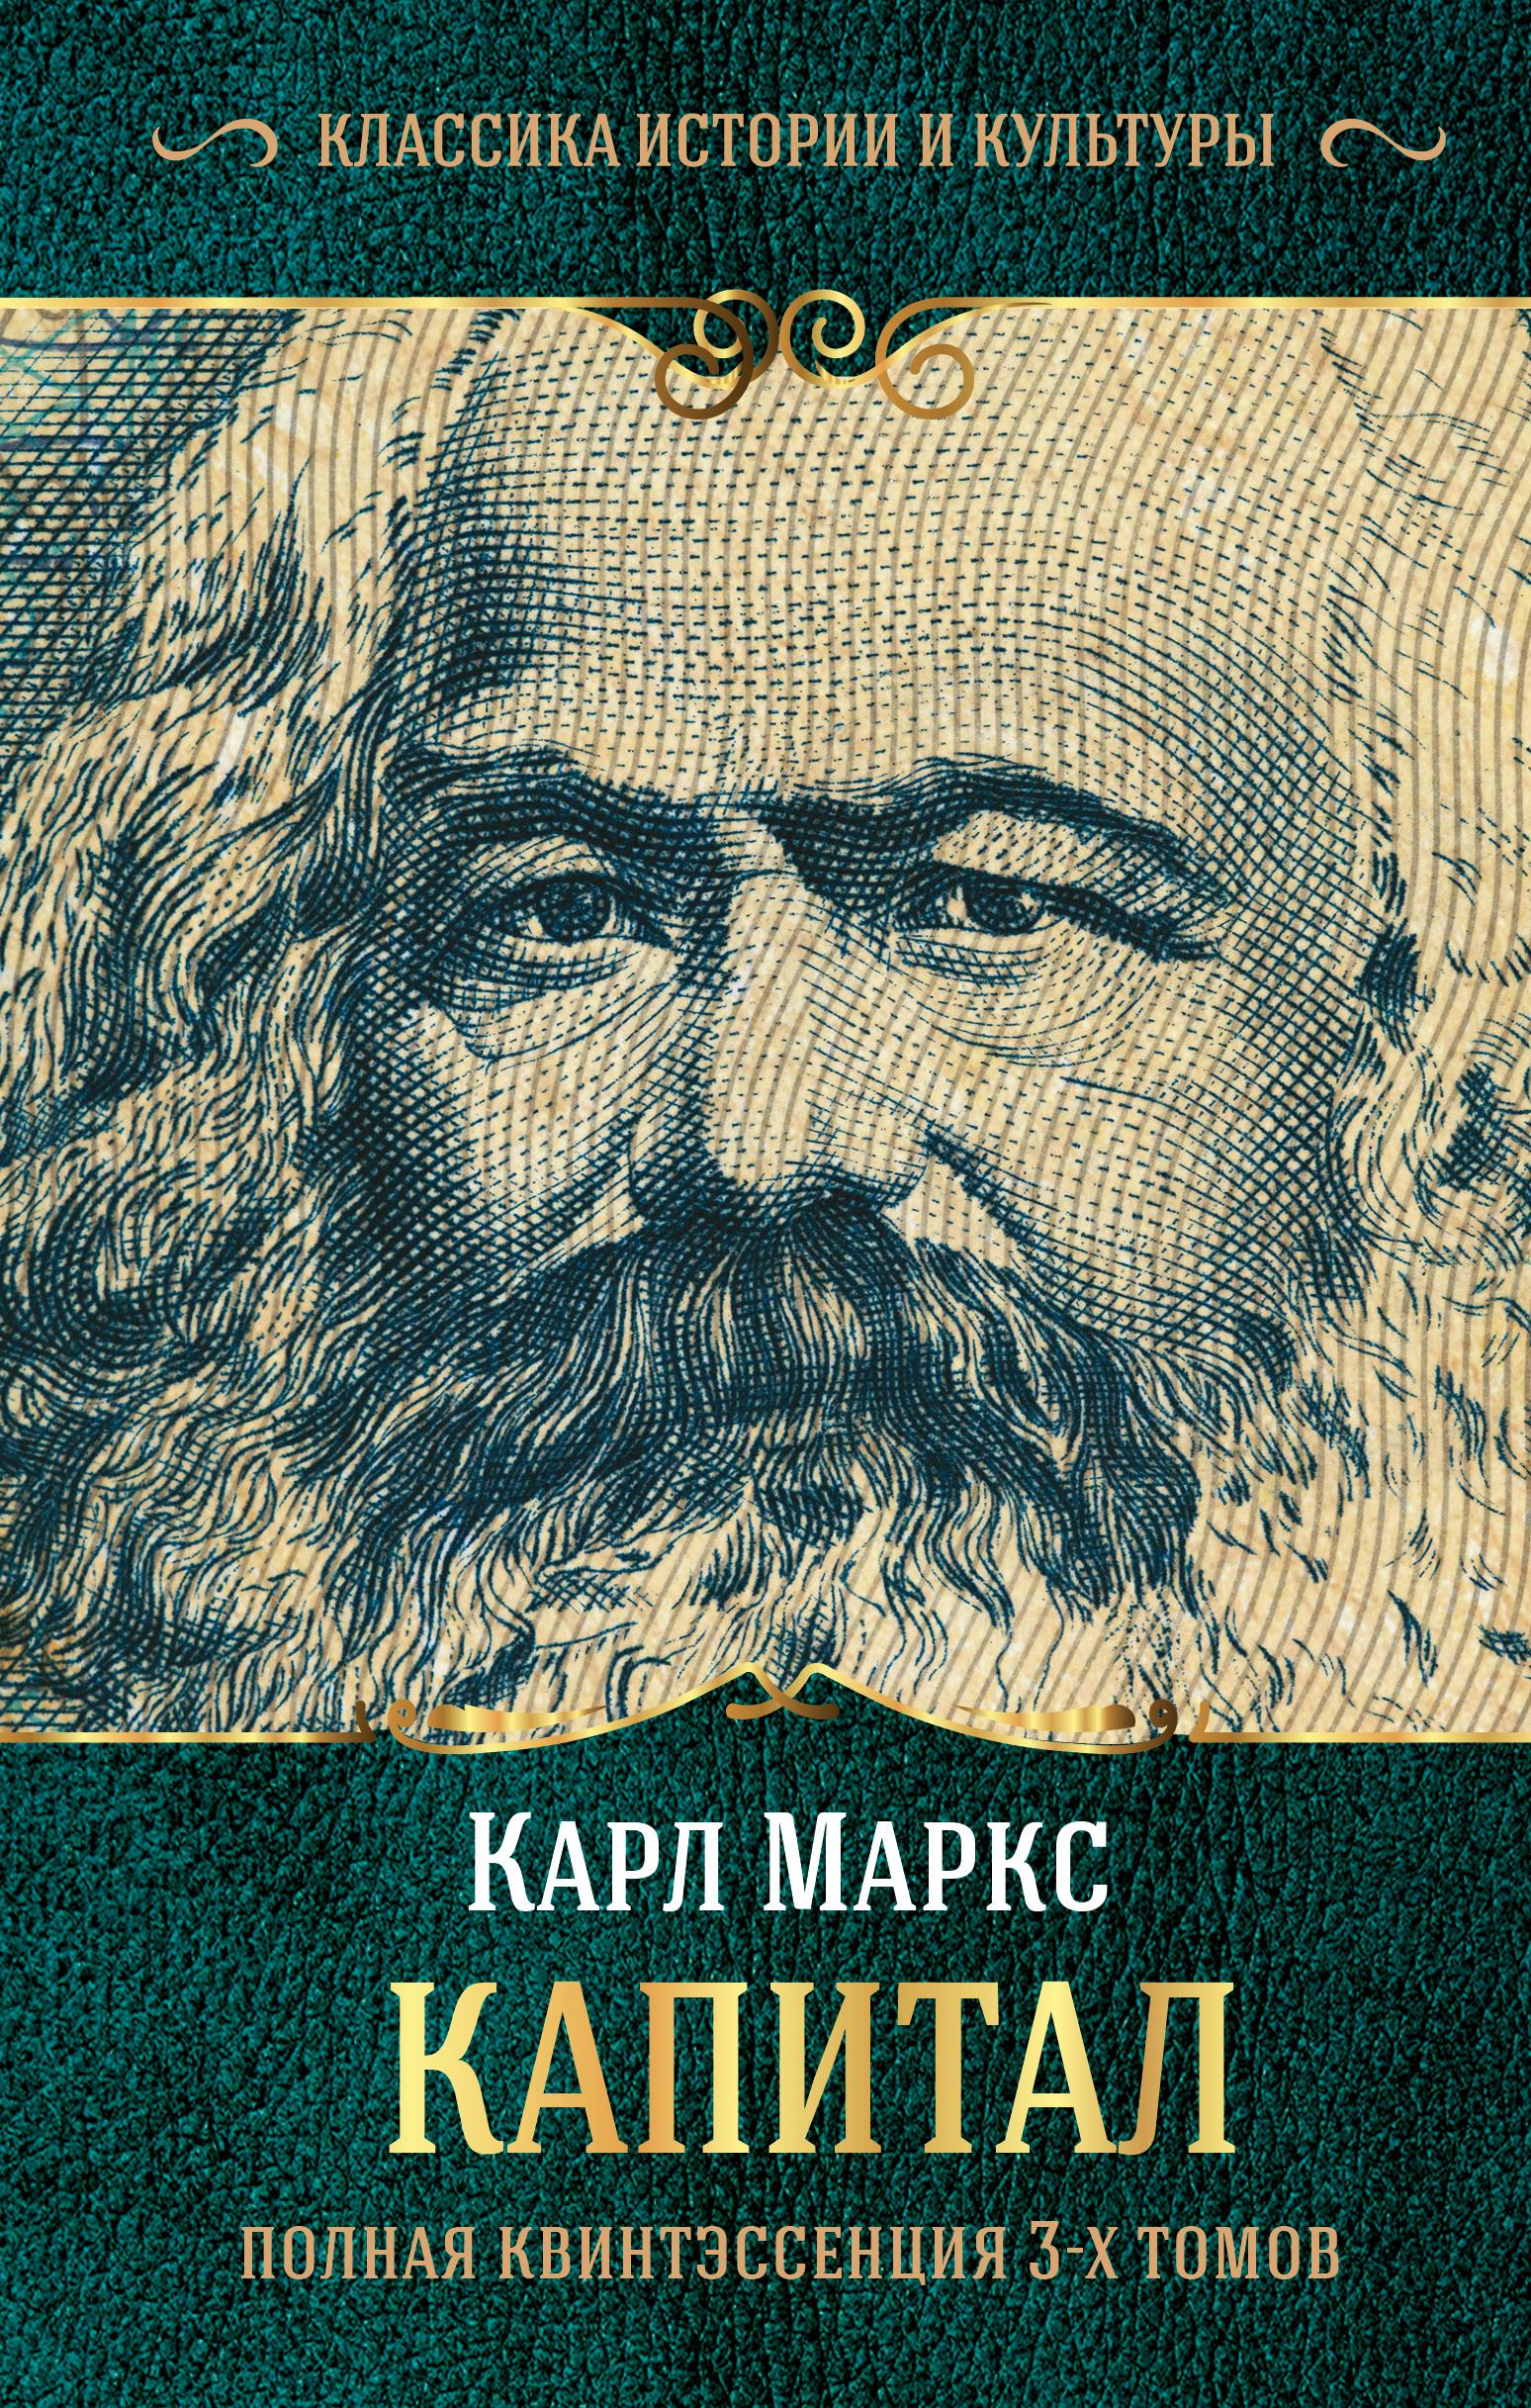 Маркс Карл Капитал. (Полная квинтэссенция 3-х томов)